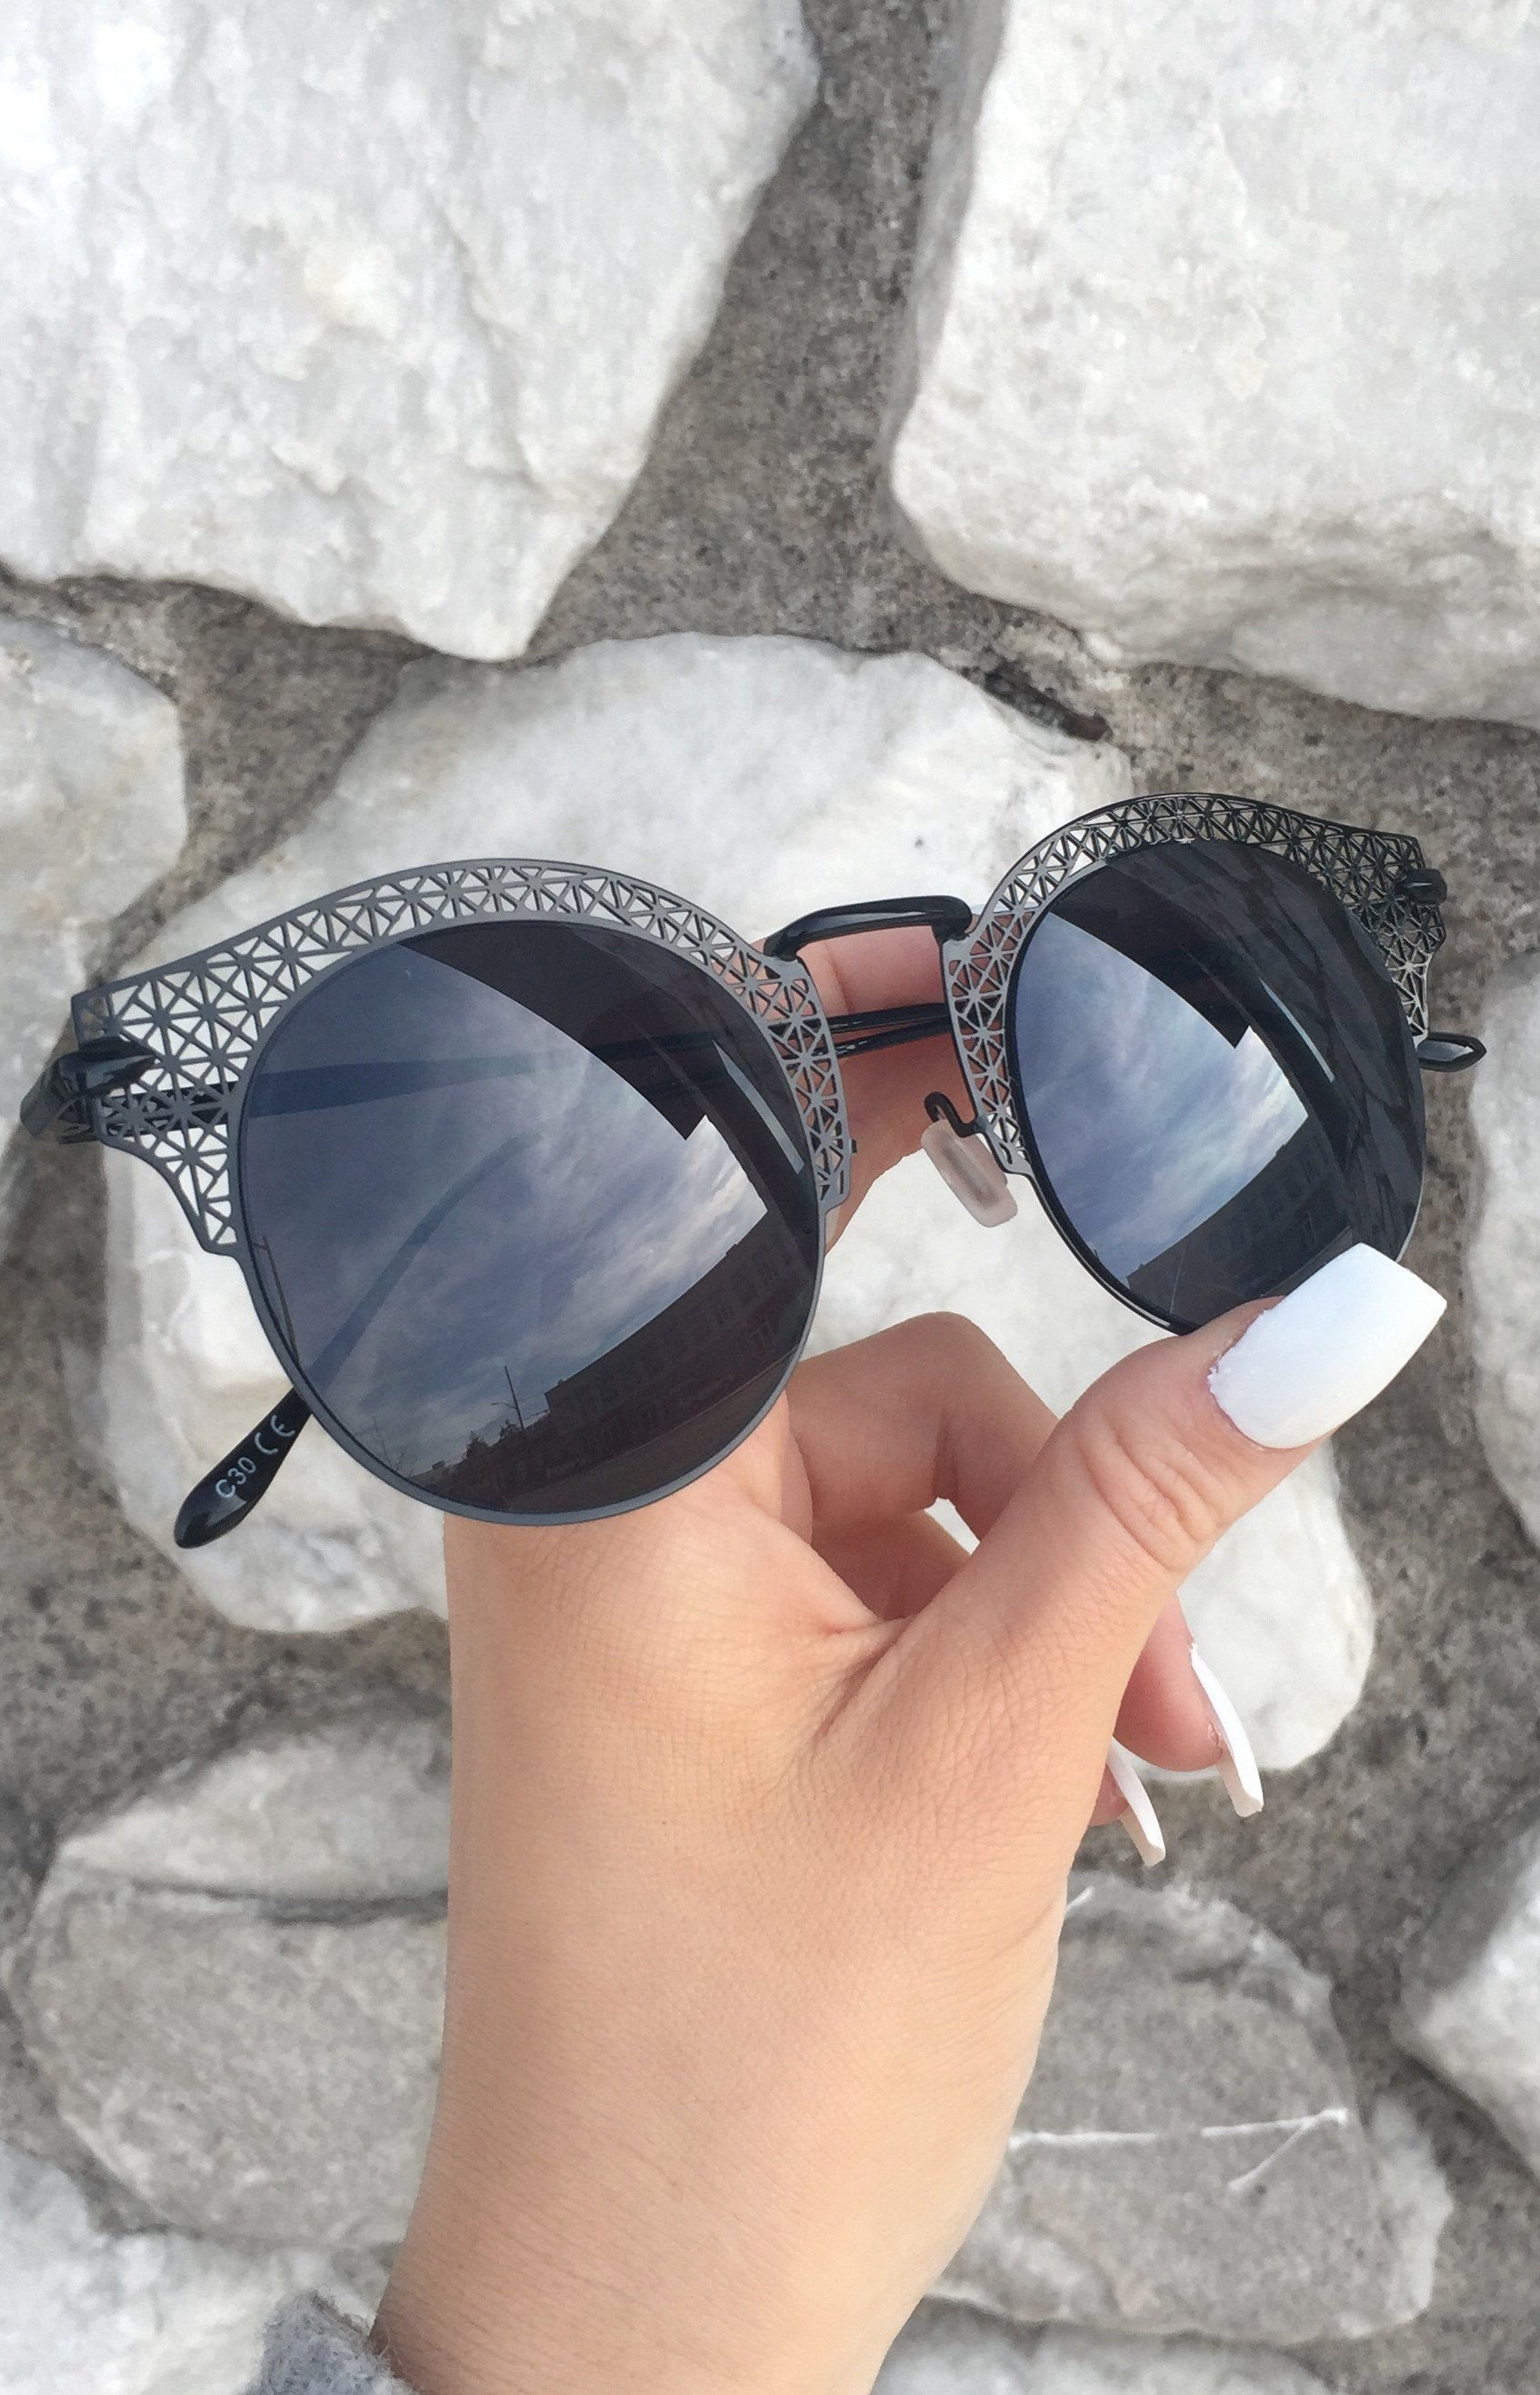 7bd082119c COLOR - Black Frame Black Lens CONTENT   CARE - Handmade   Imported - One